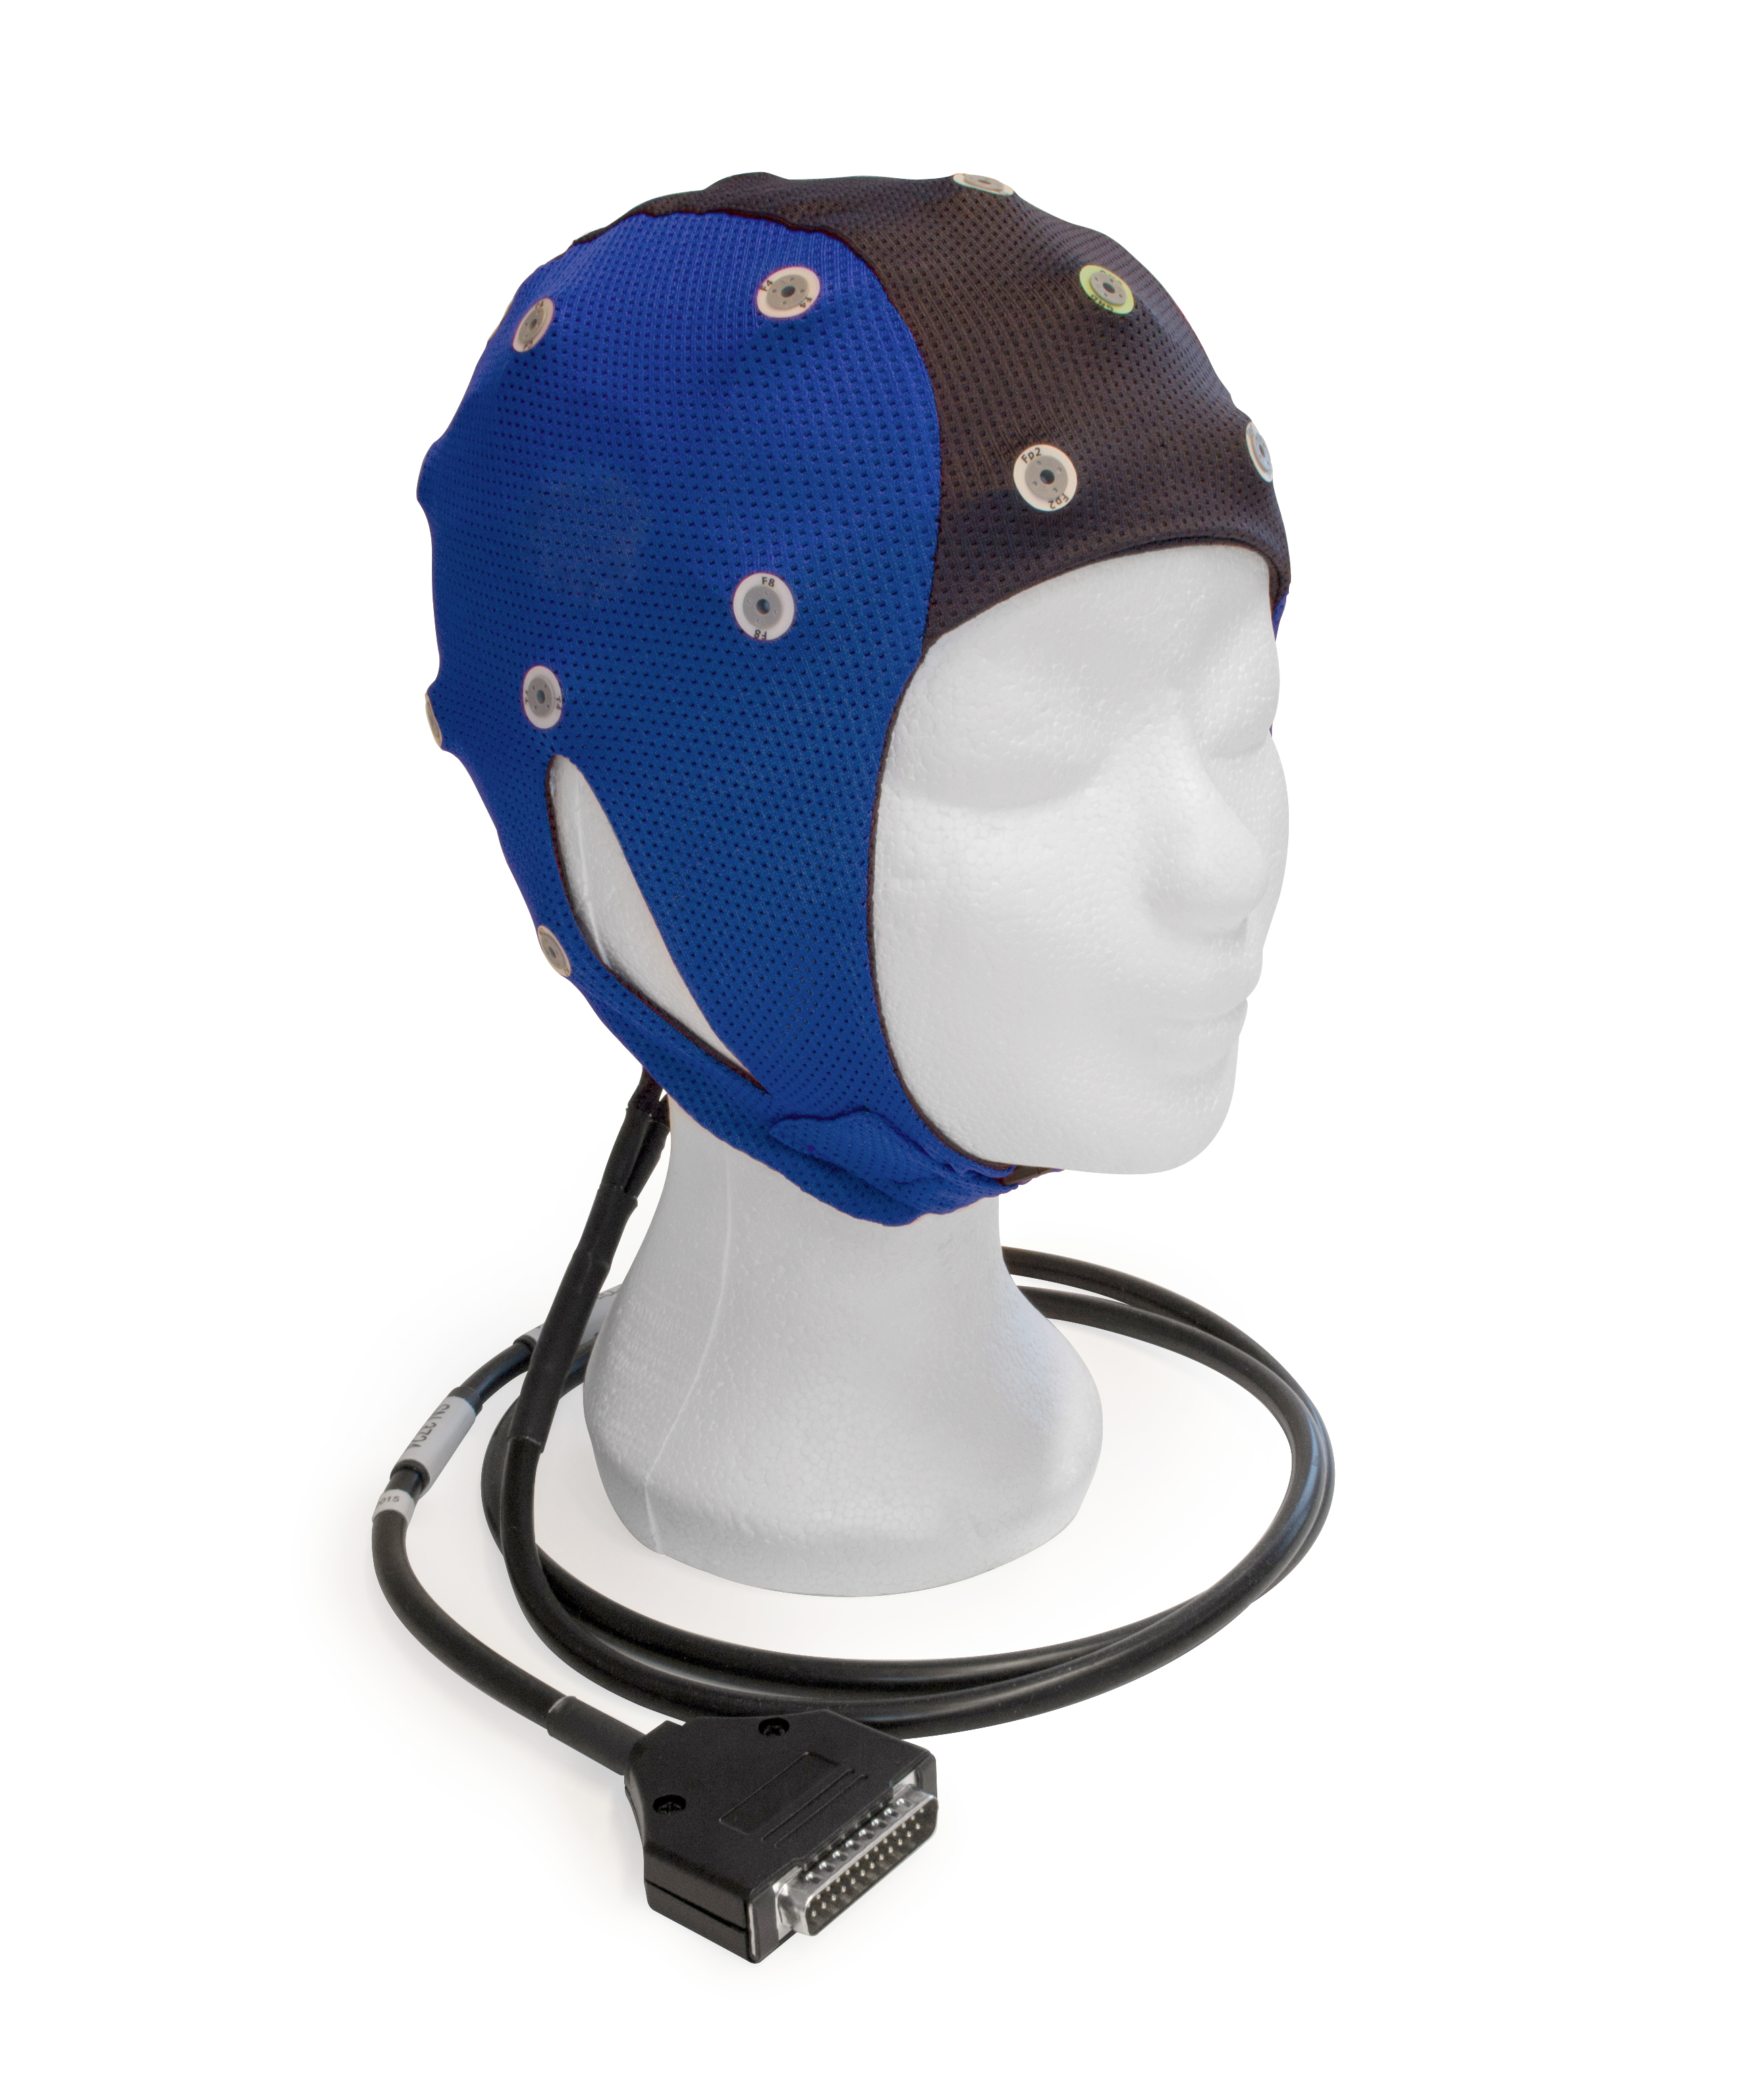 EEG čepice ANT-Neuro waveguard™ connect: L (56 – 61 cm, Modročerná)